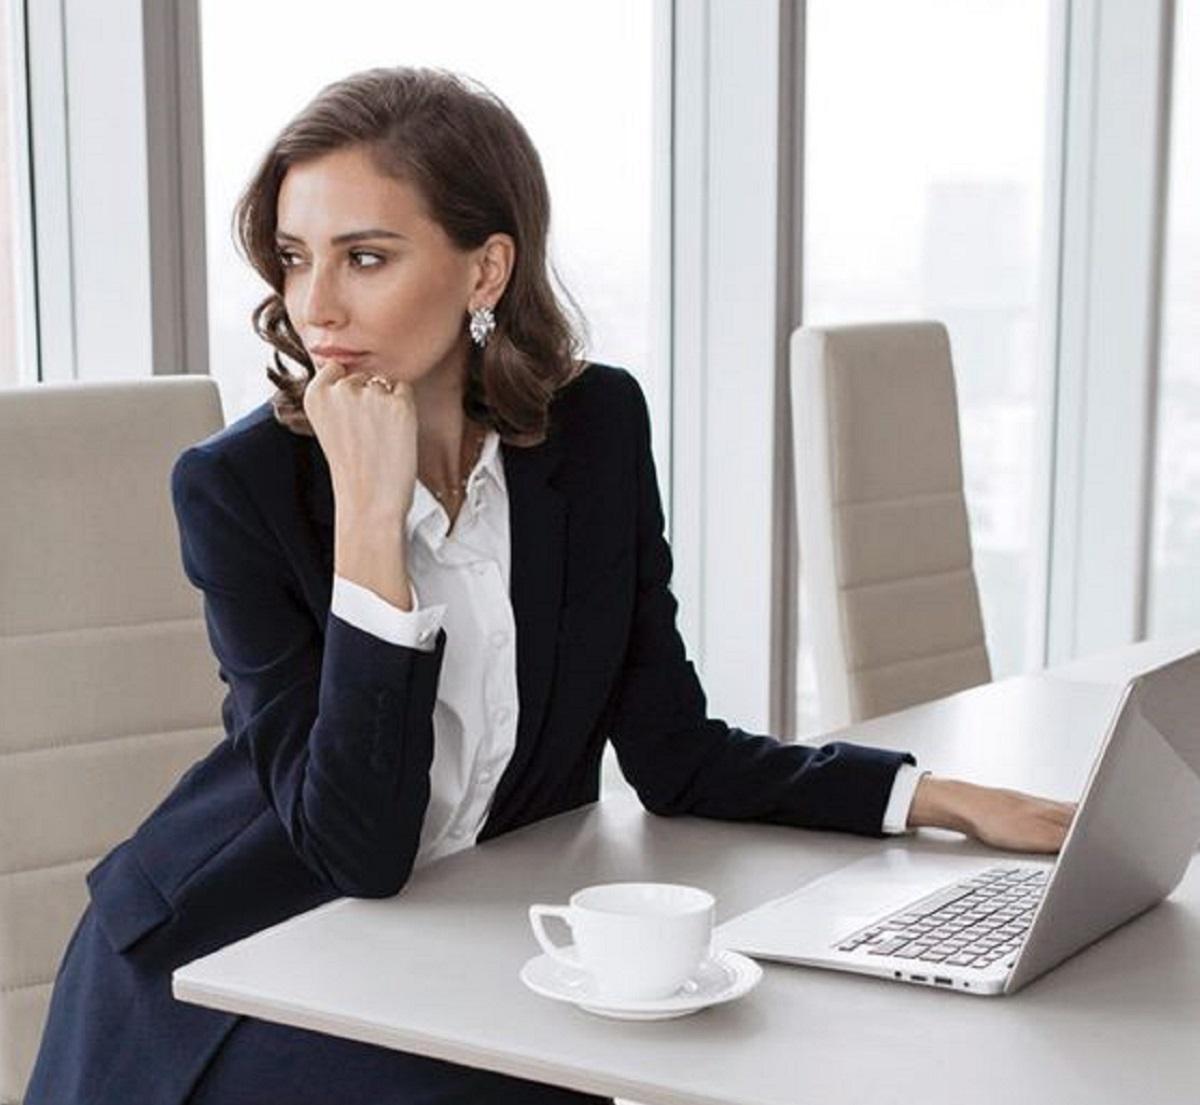 consigli di bellezza per donne impegnate